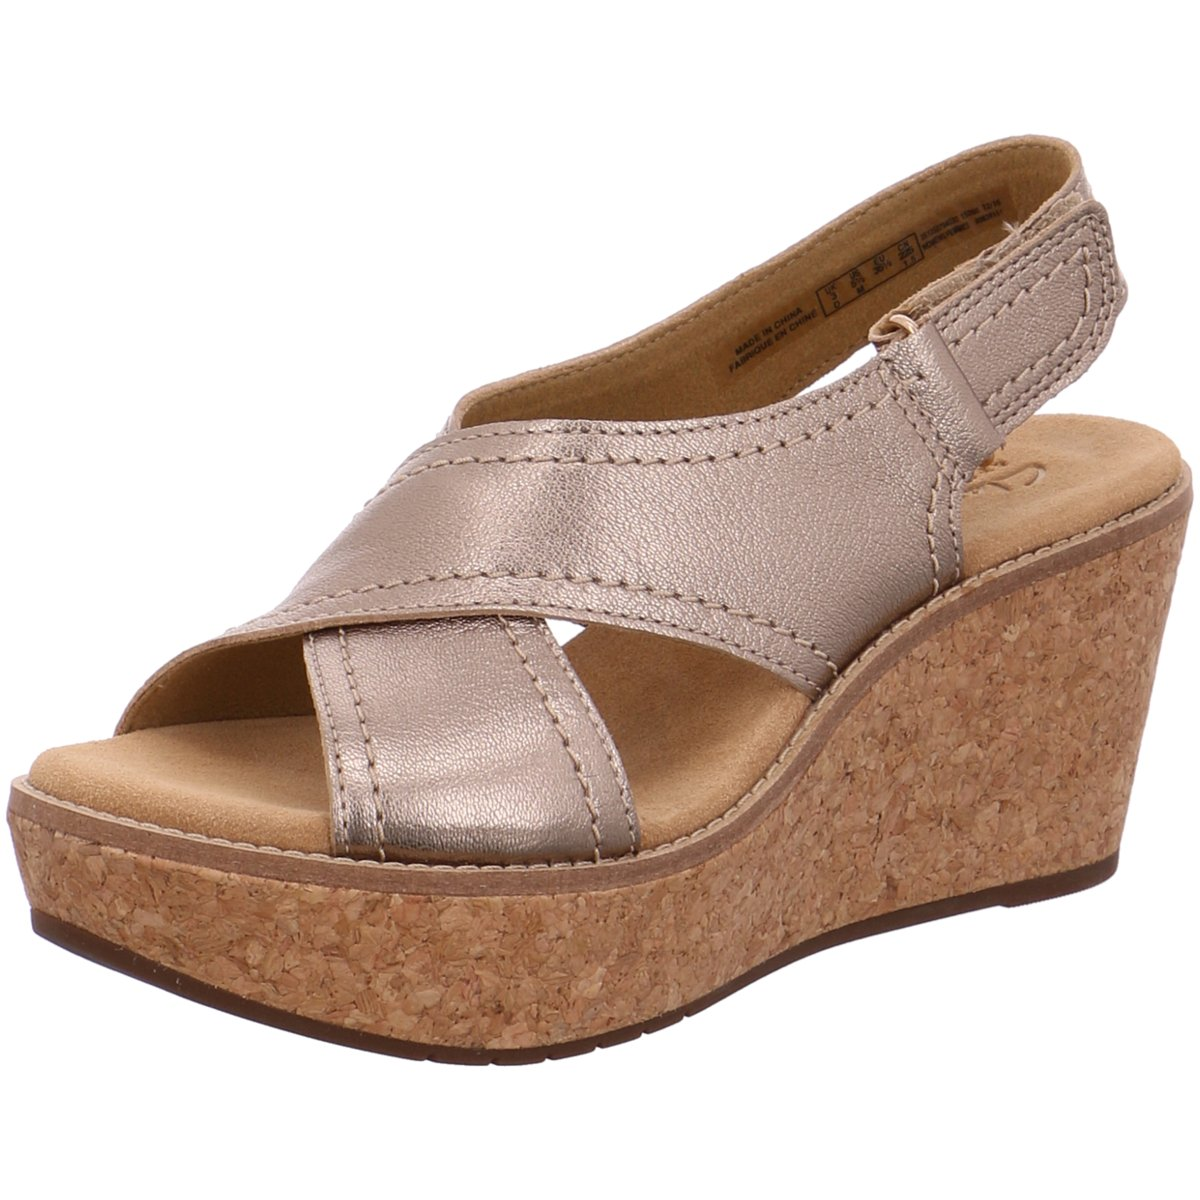 uk availability 63855 3ce87 Details zu Clarks Damen Sandaletten AISLEY TULIP 261250794 braun 262630